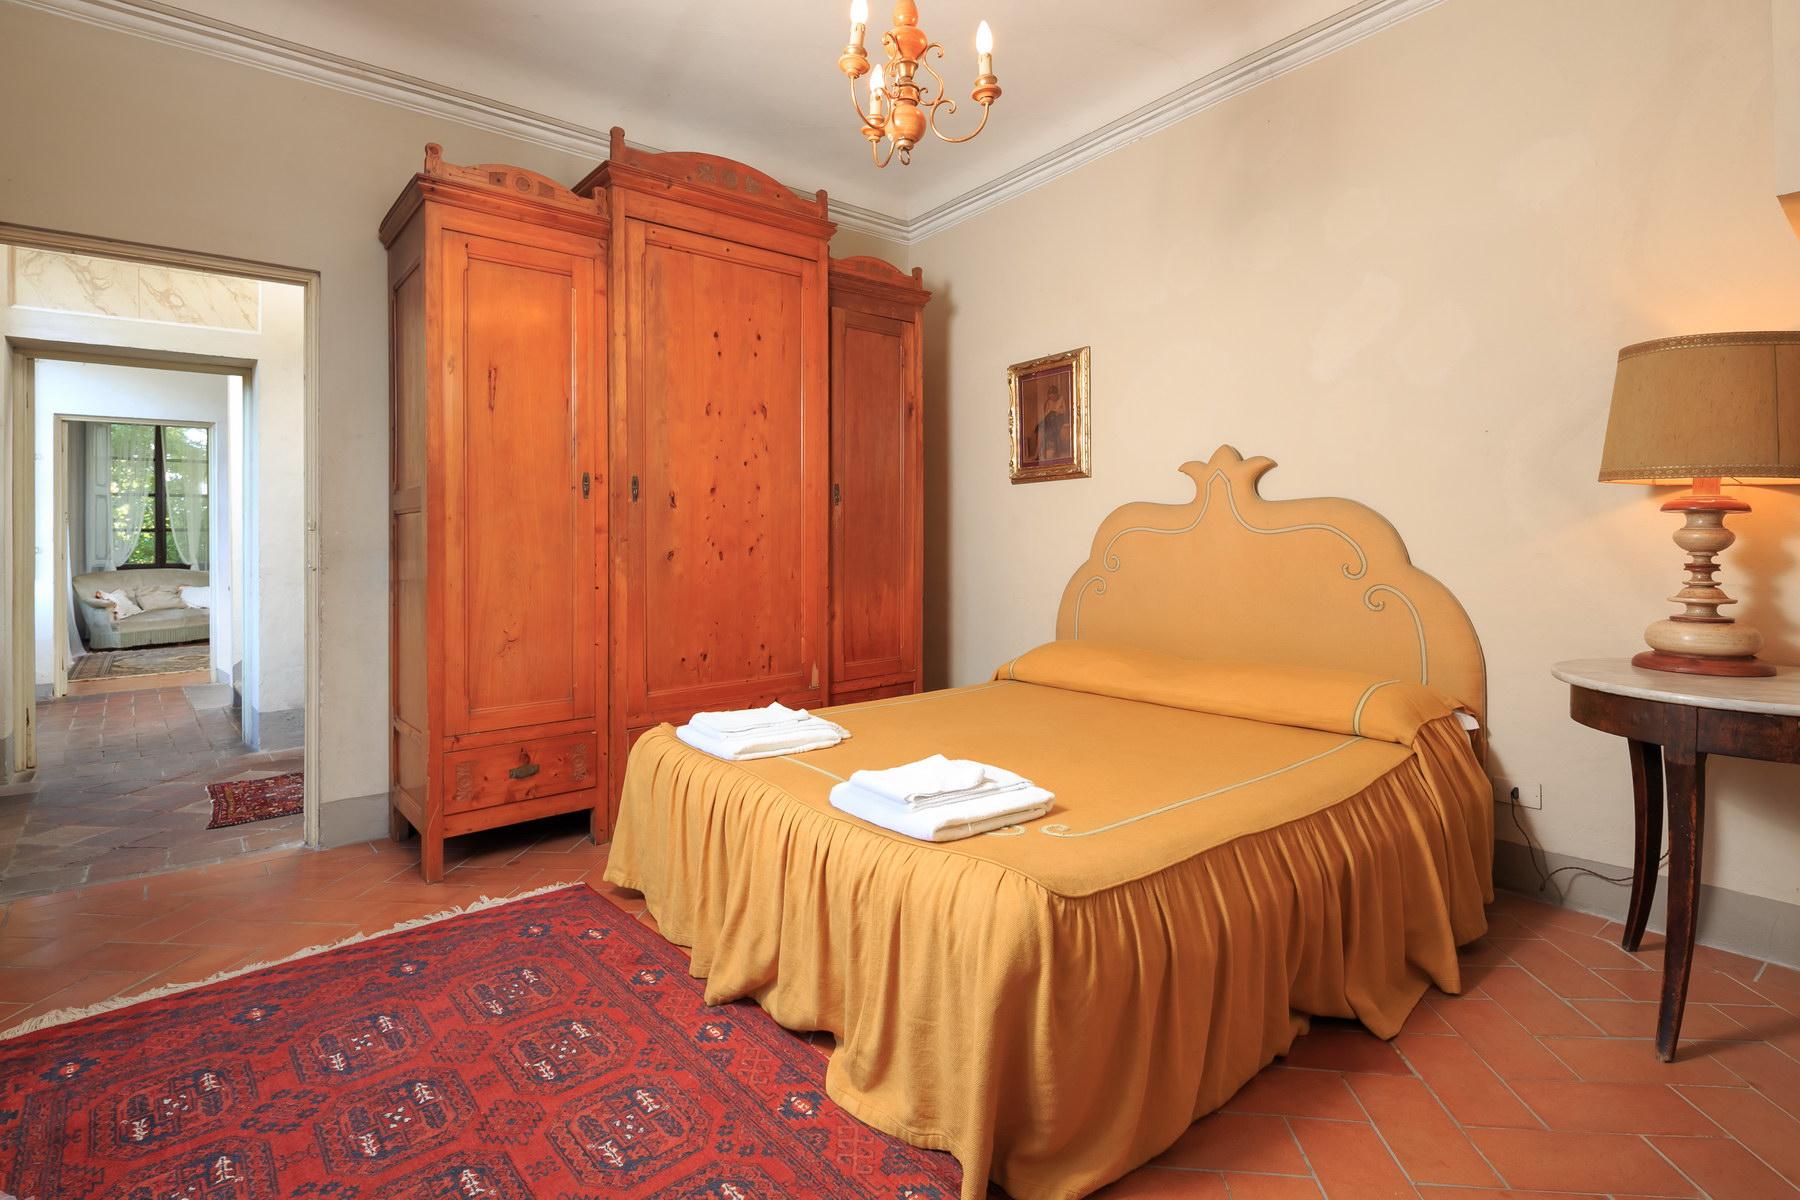 Villa in Vendita a Capannori: 5 locali, 570 mq - Foto 21